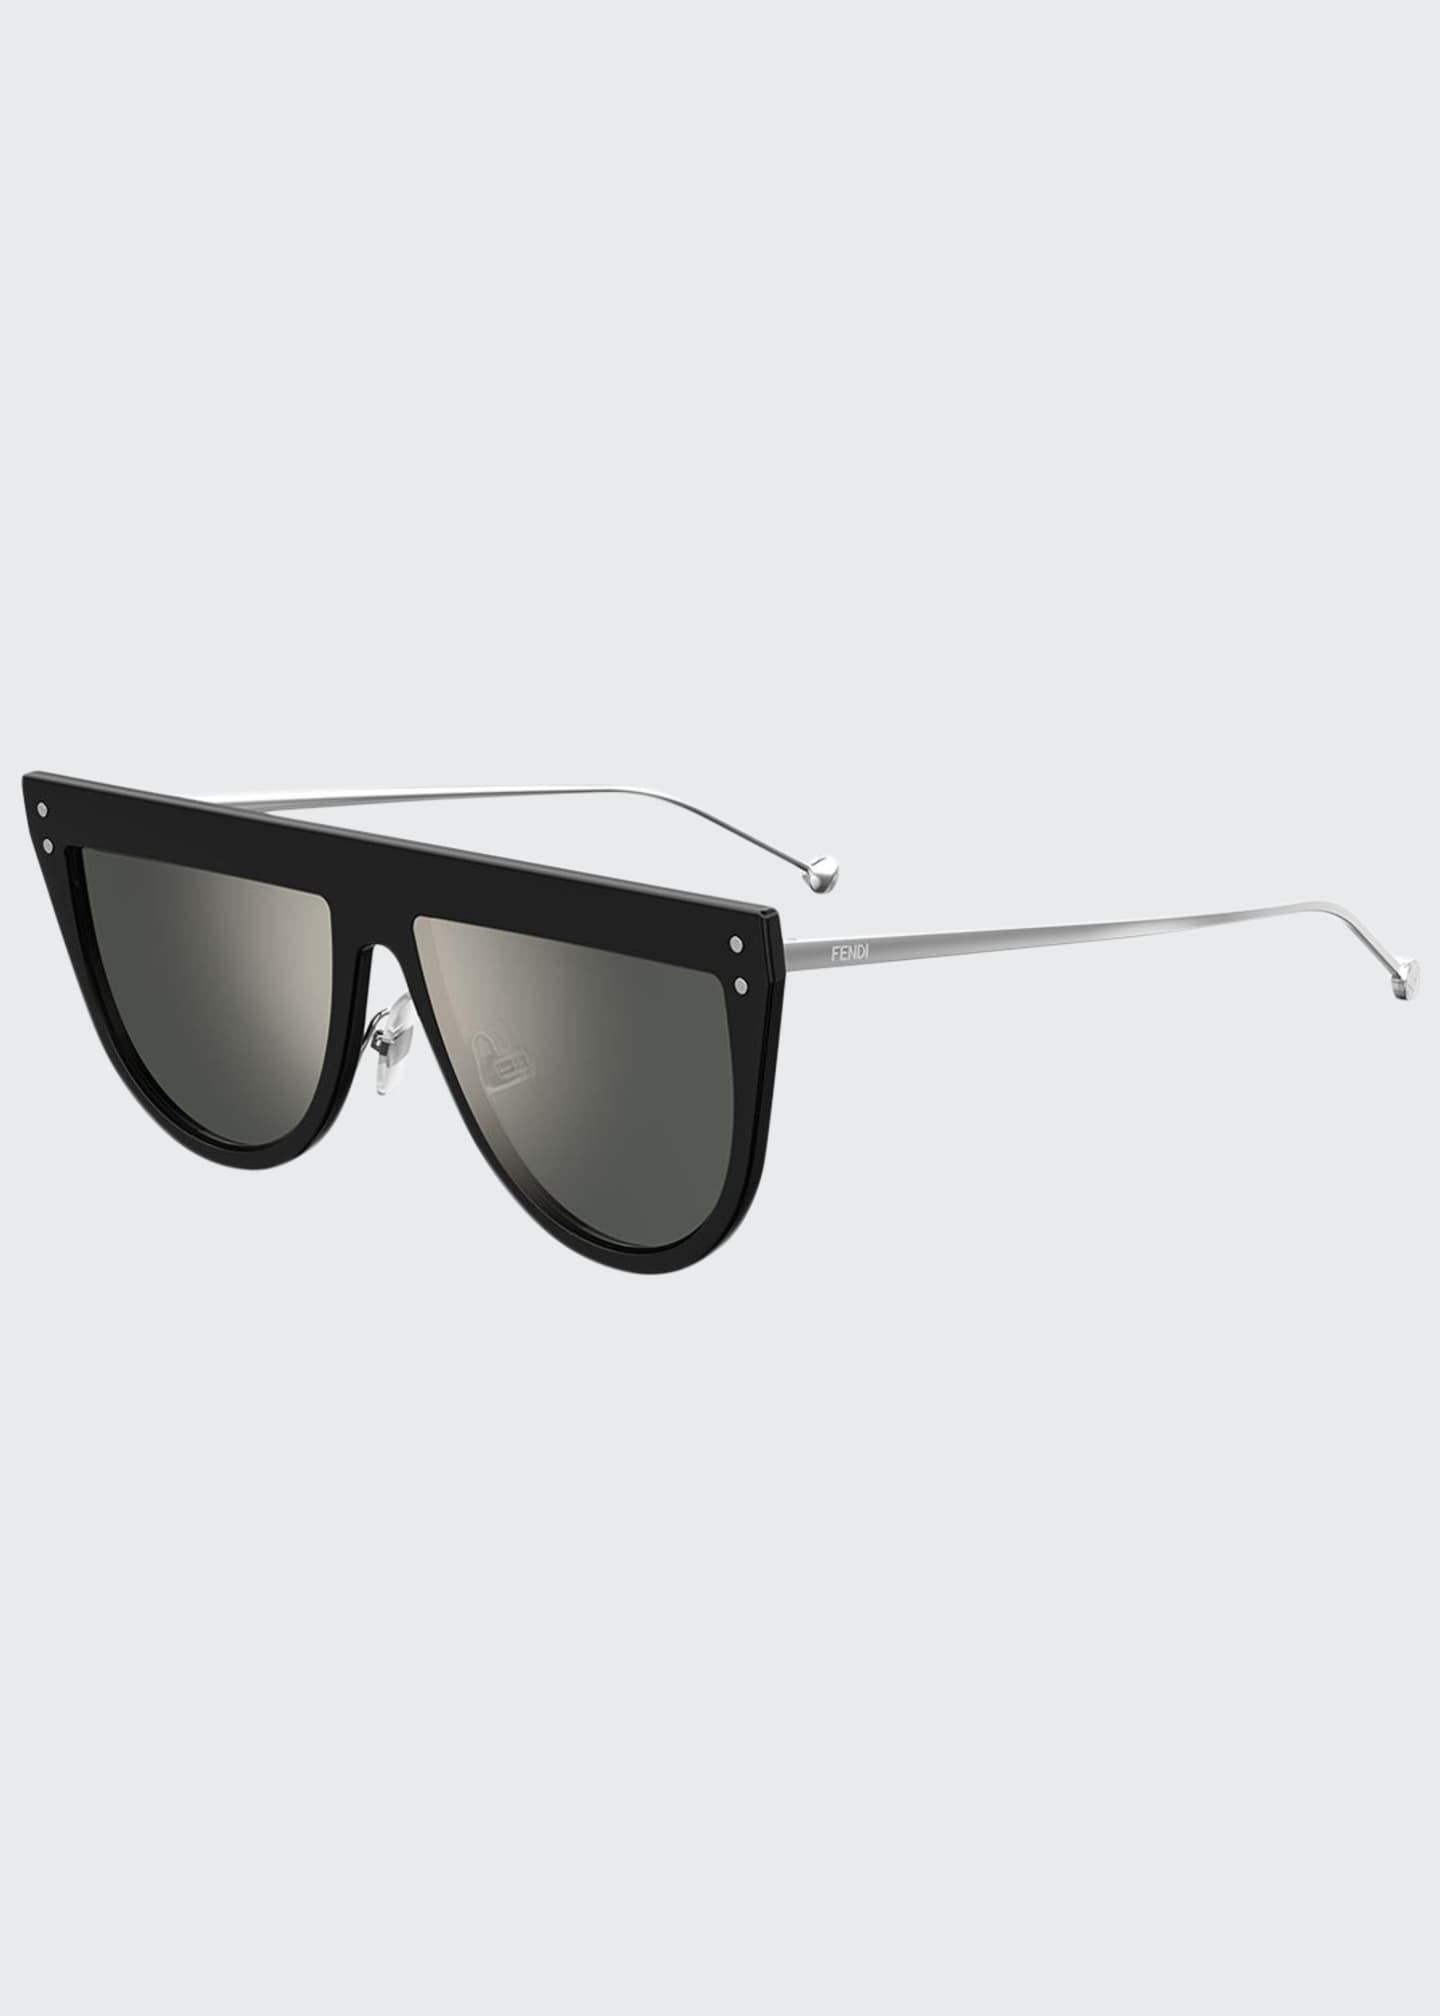 Fendi Flat-Top Mirrored Shield Sunglasses